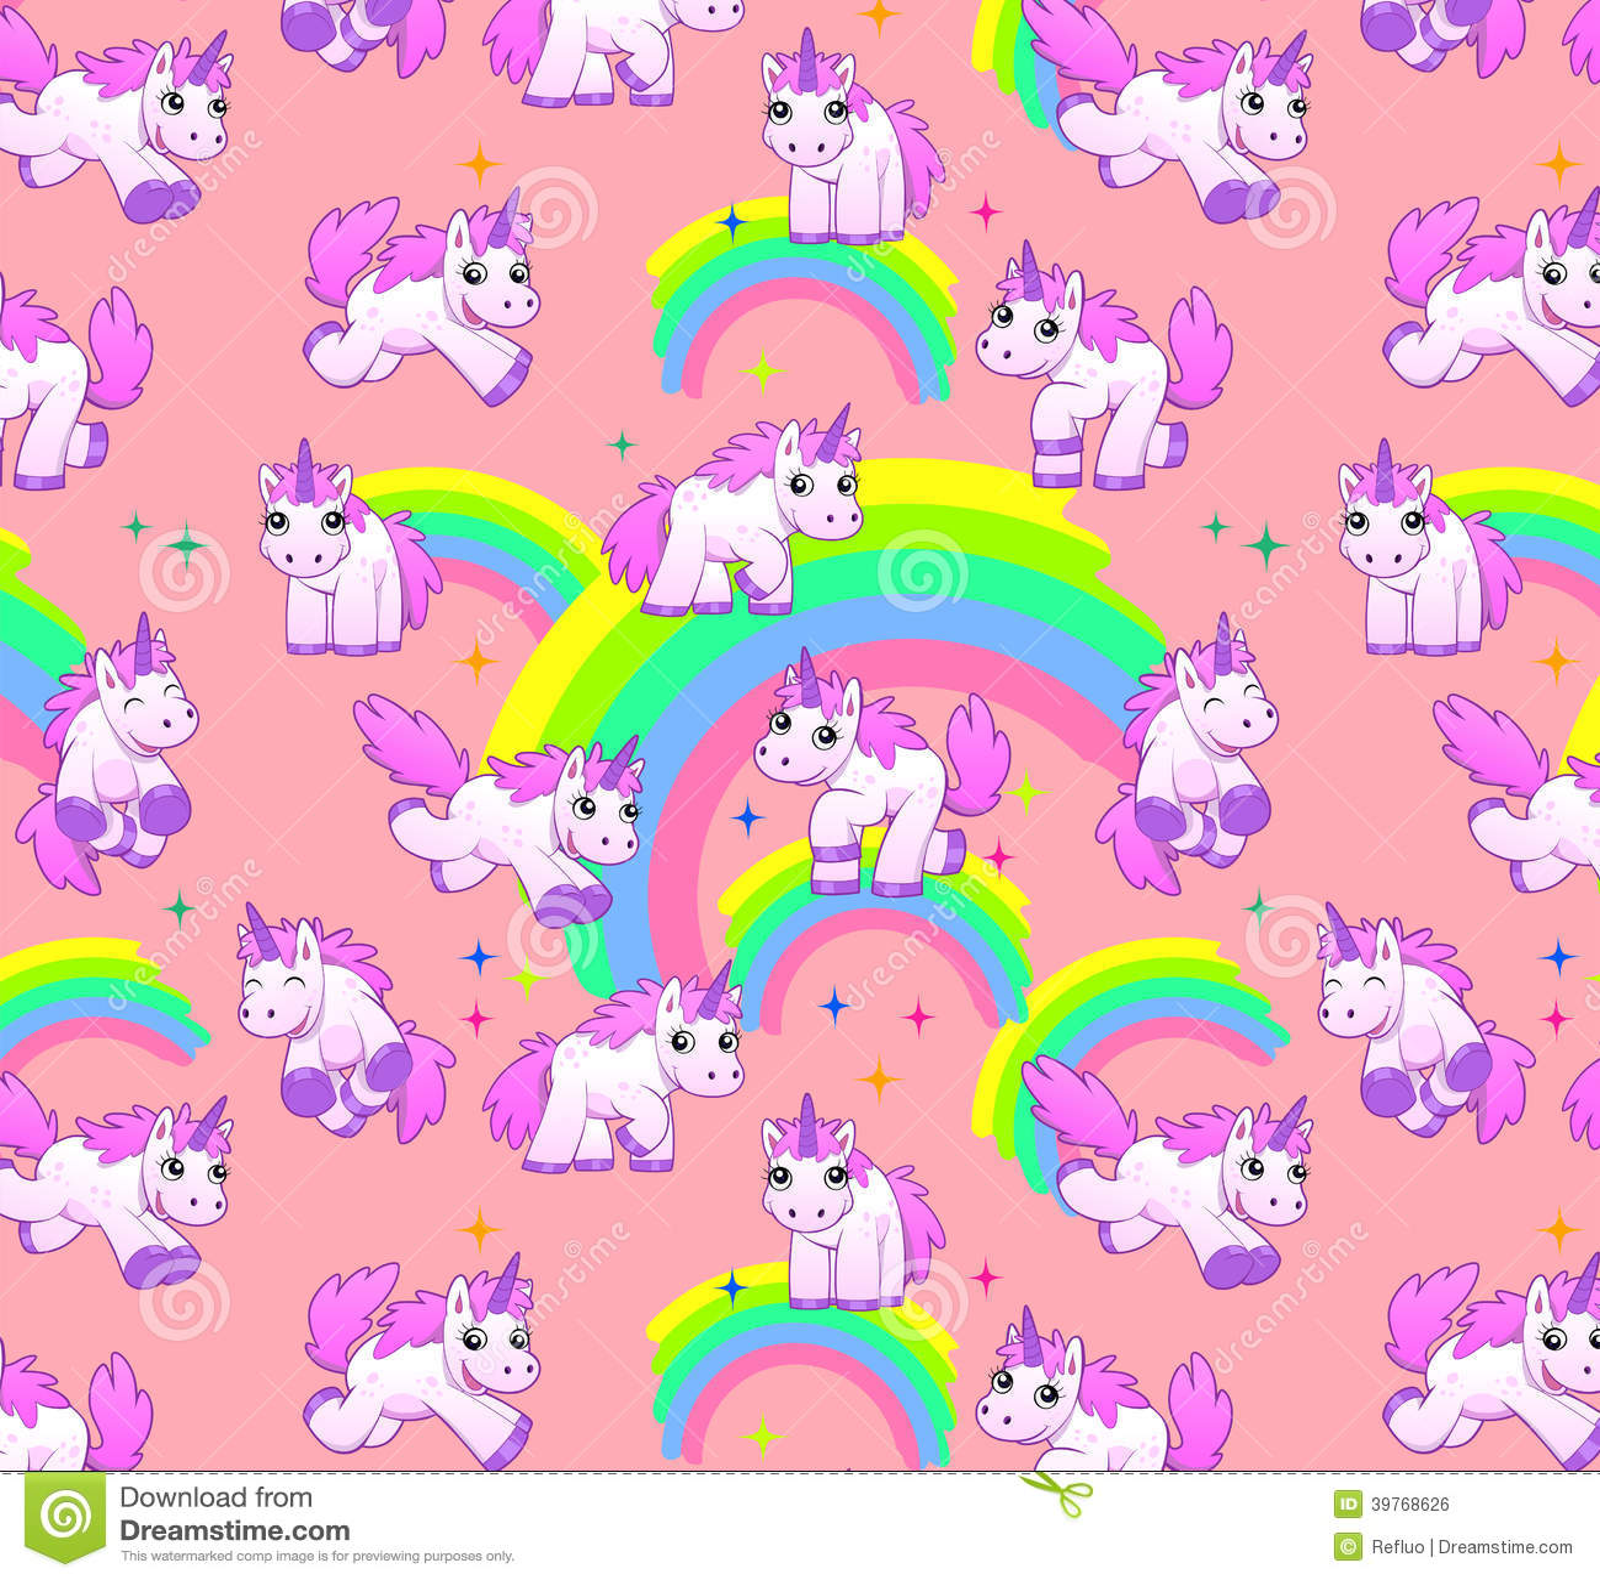 unicorn pattern pink stock illustration image 39768626